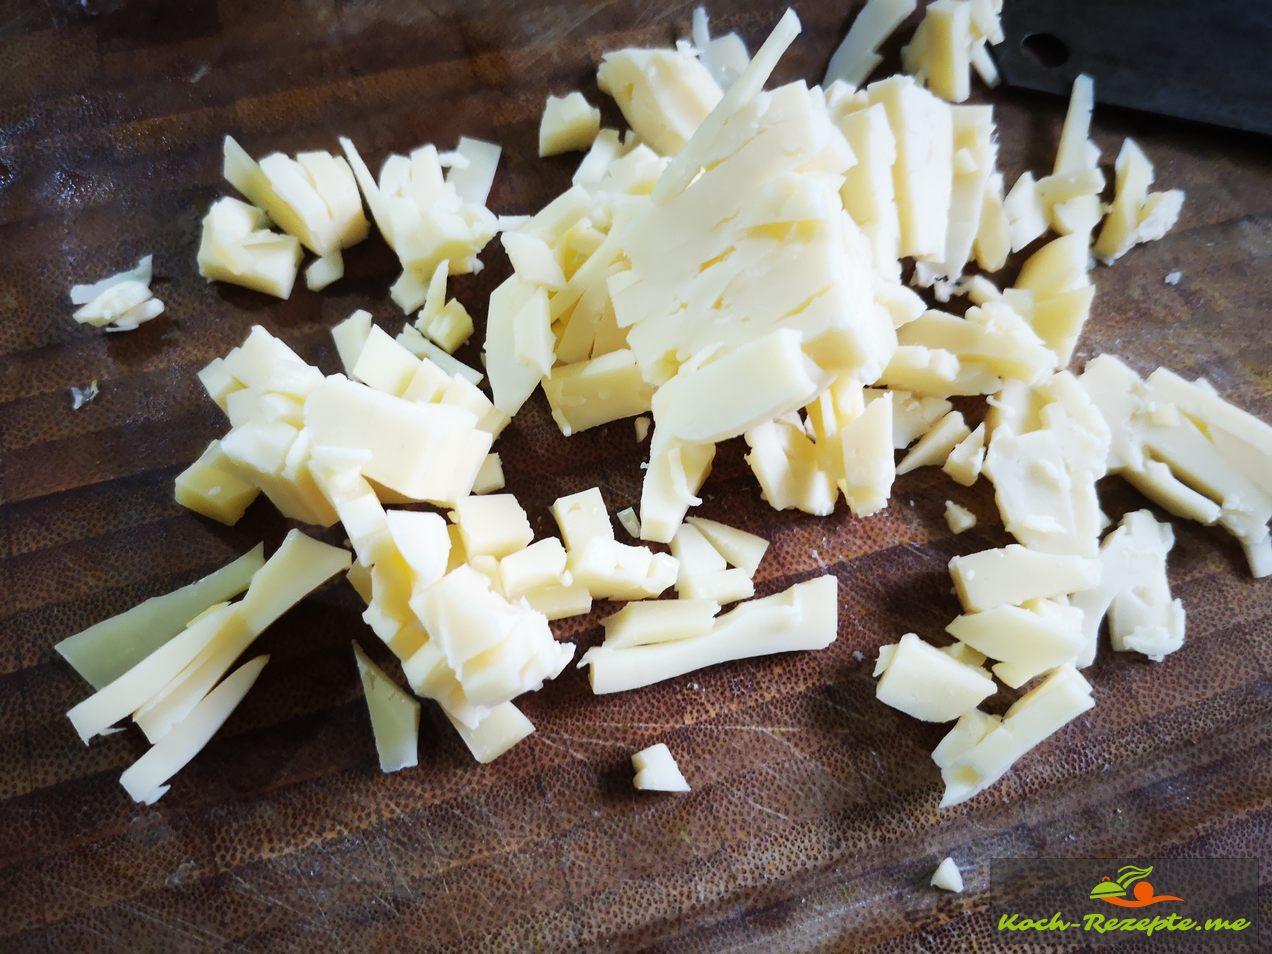 Käse dann fein hacken